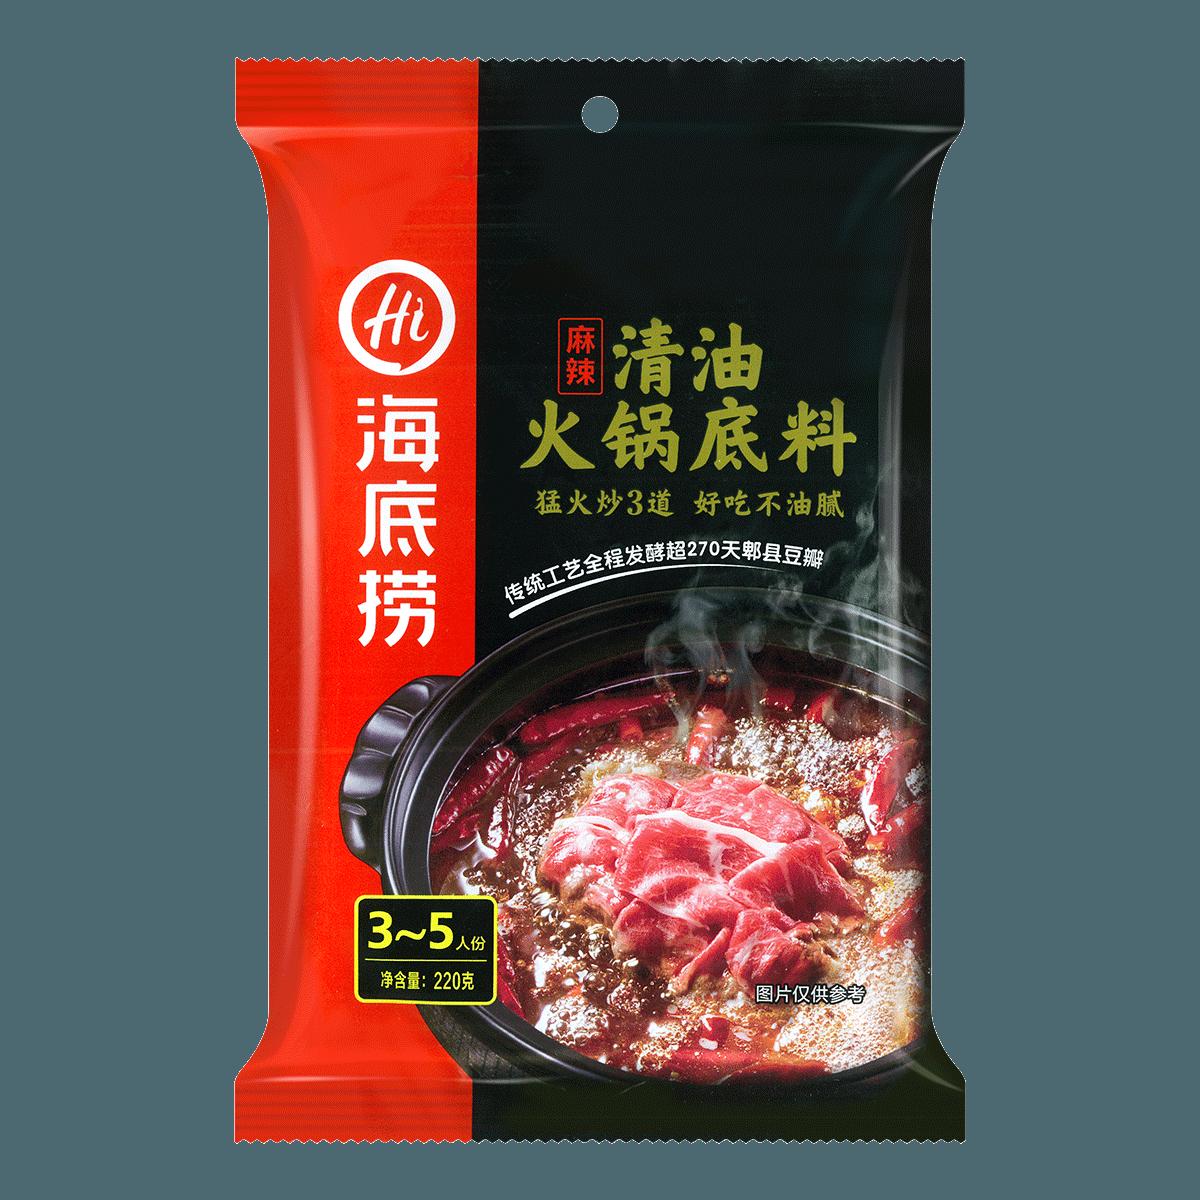 Yamibuy.com:Customer reviews:Hot Pot Seasoning Spicy Flavor 220g